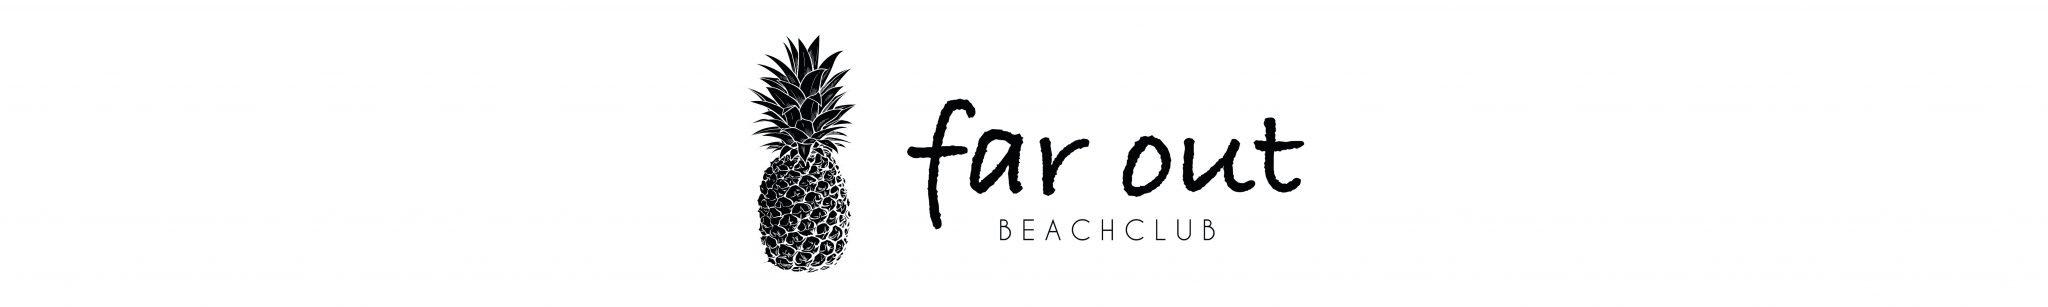 Beachclub Far Out